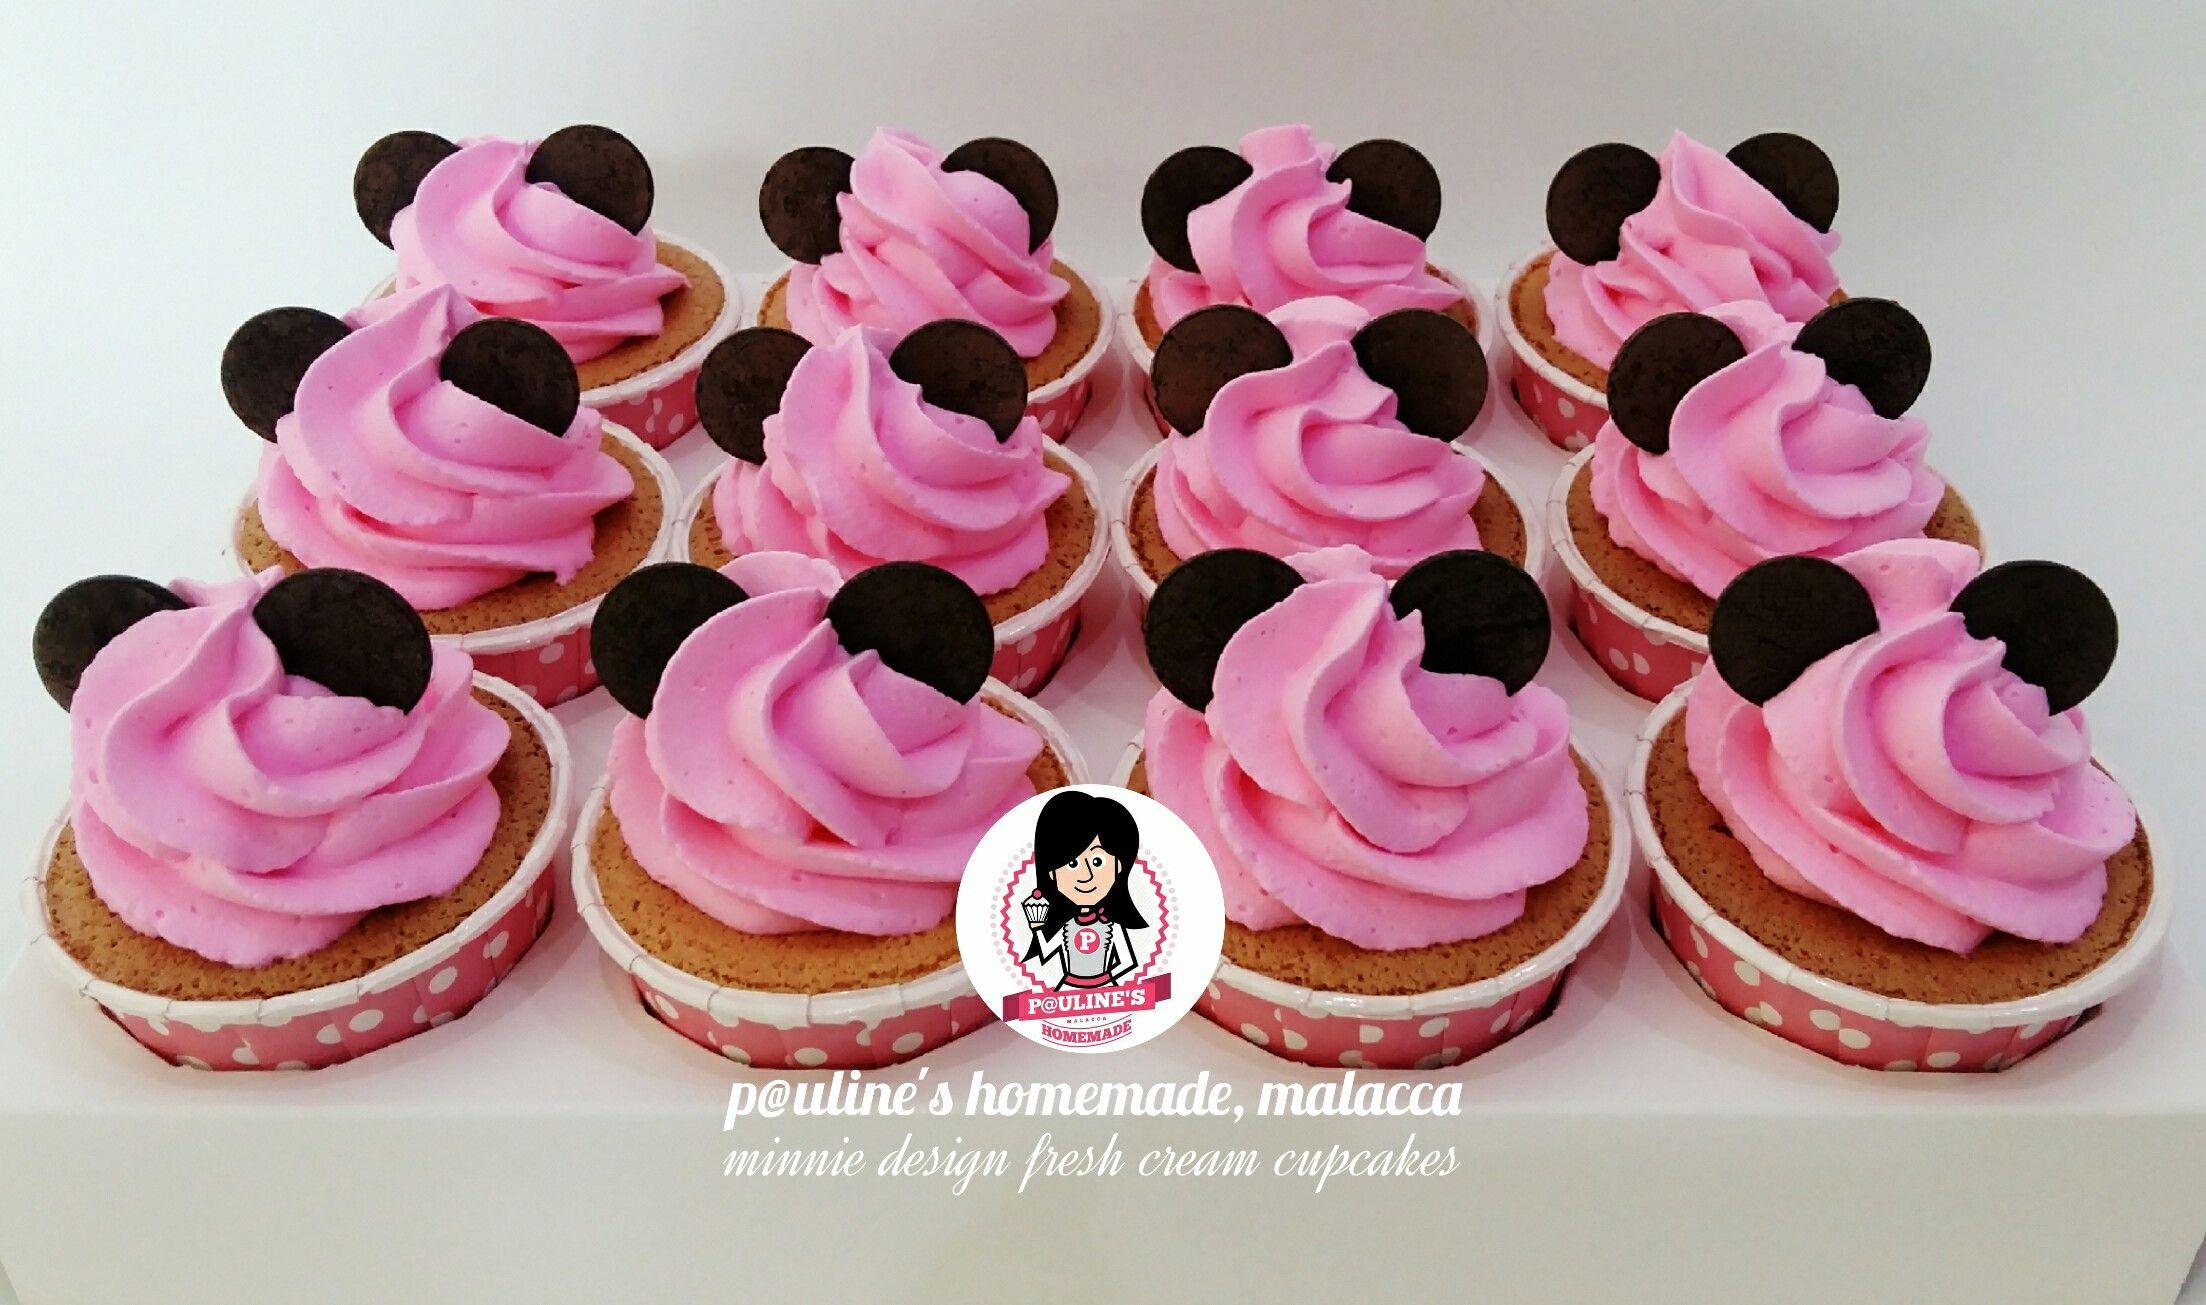 ♡ Minnie ♡ Design Fresh Cream Cupcakes